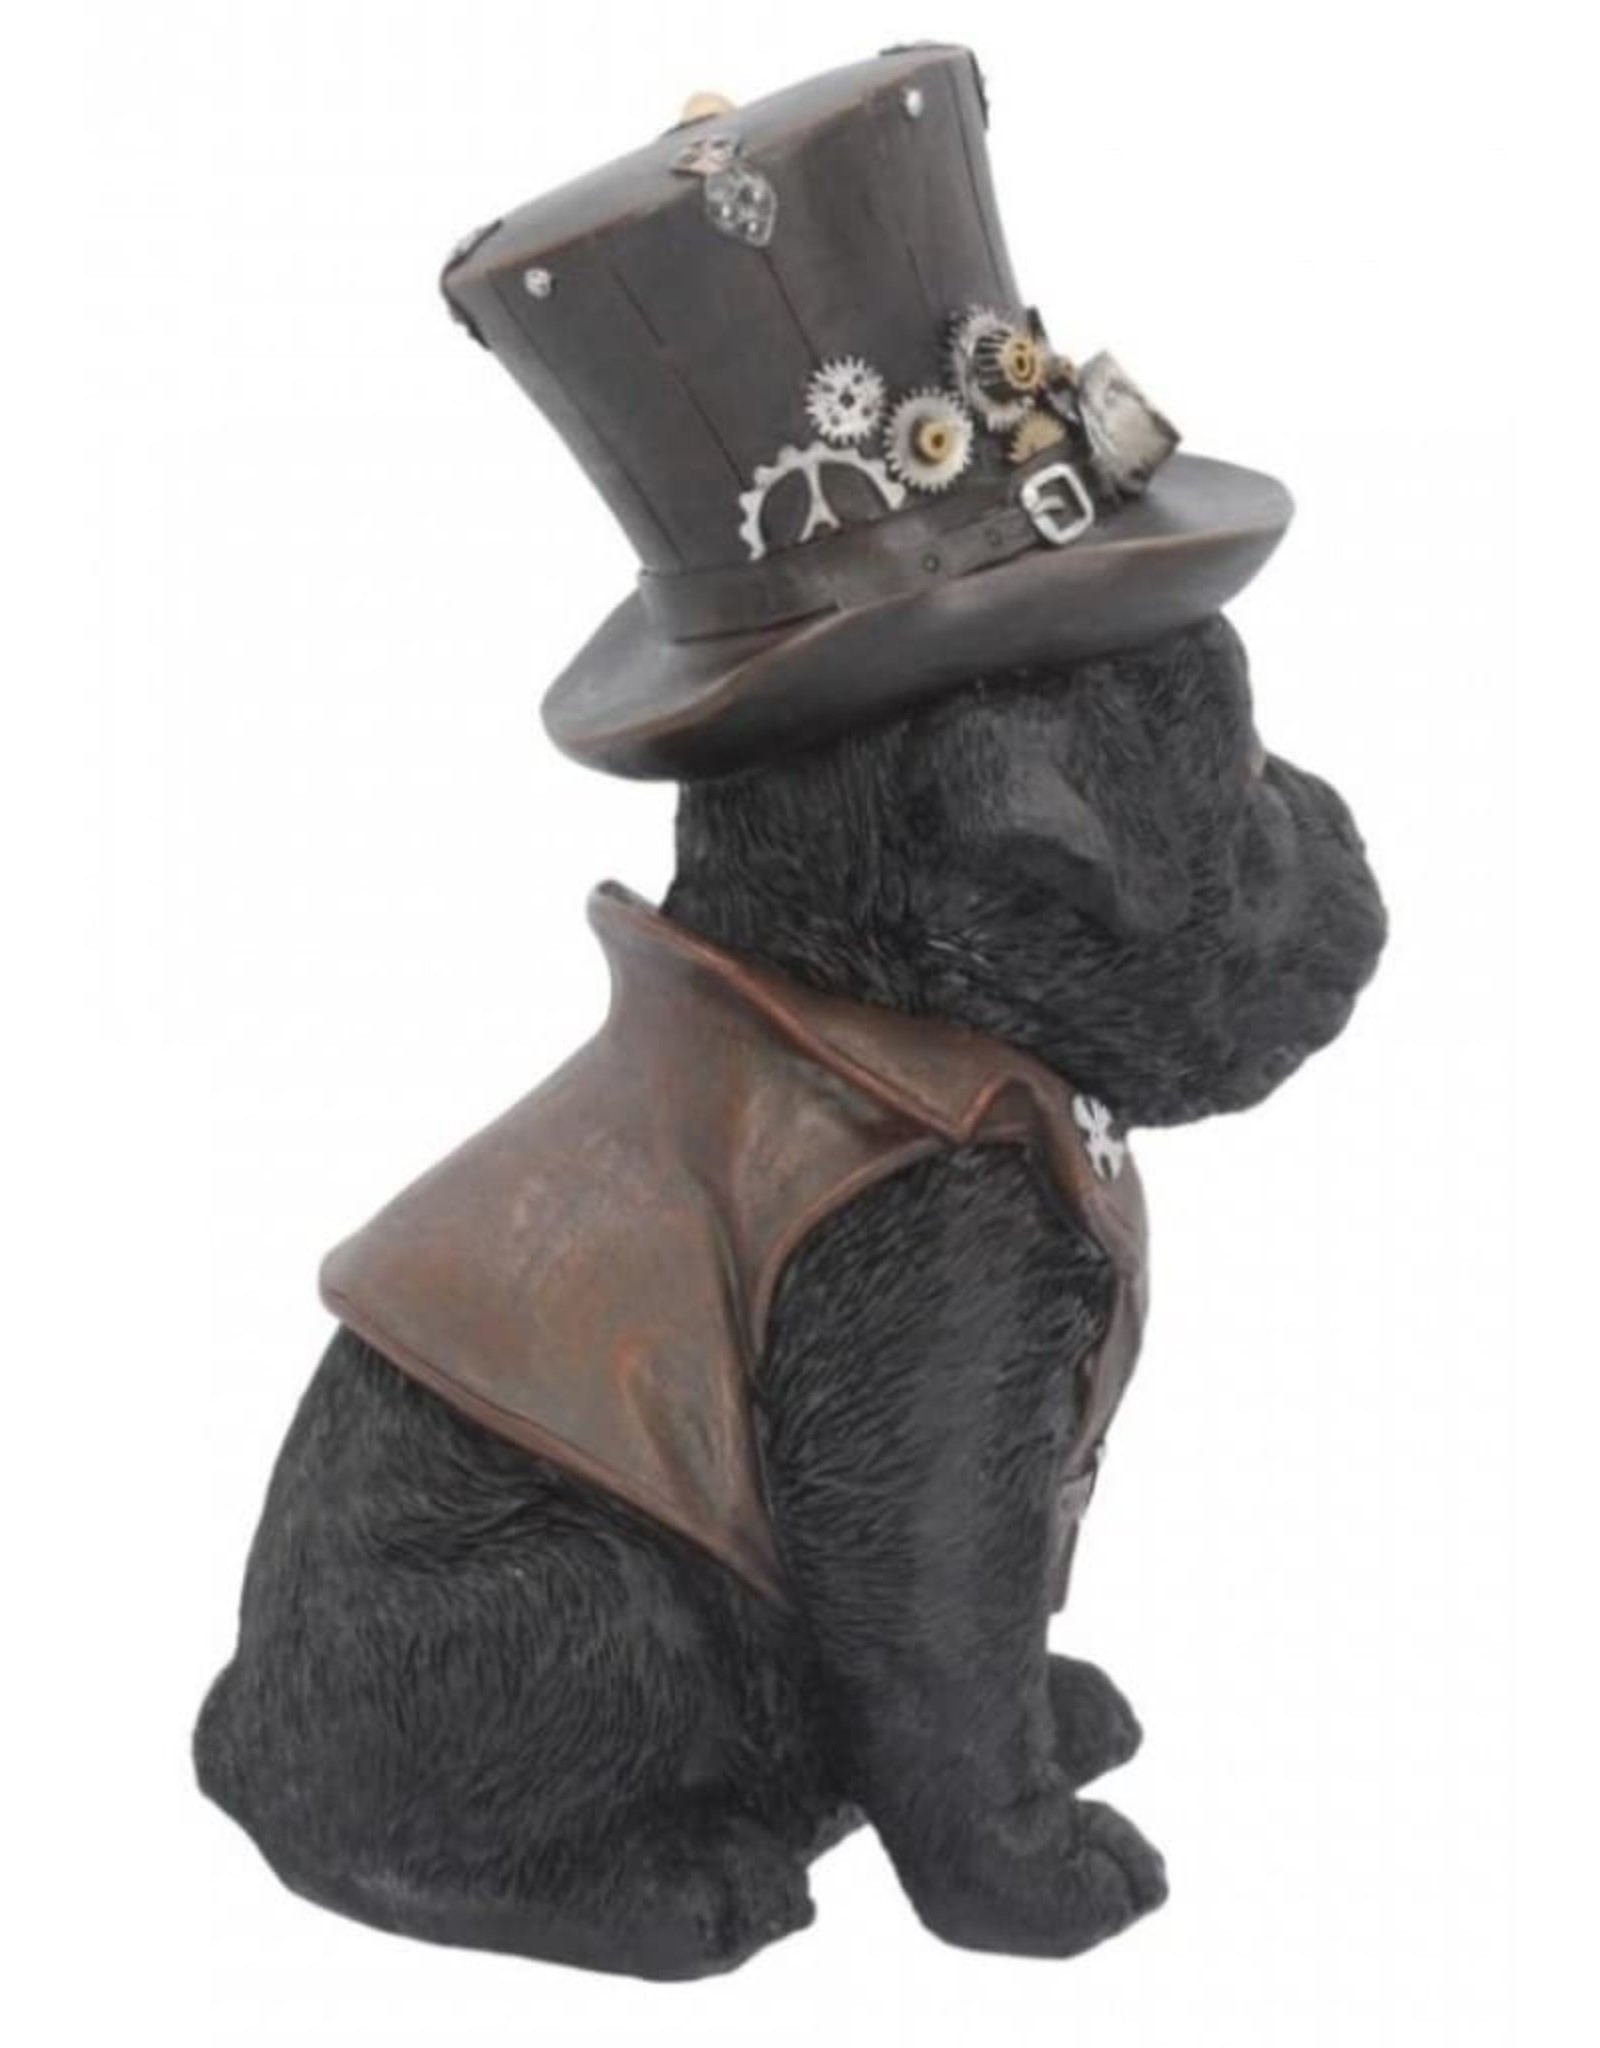 Alator Collectables - Steampunk Hondje met hoge hoed Cogsmiths - Nemesis Now